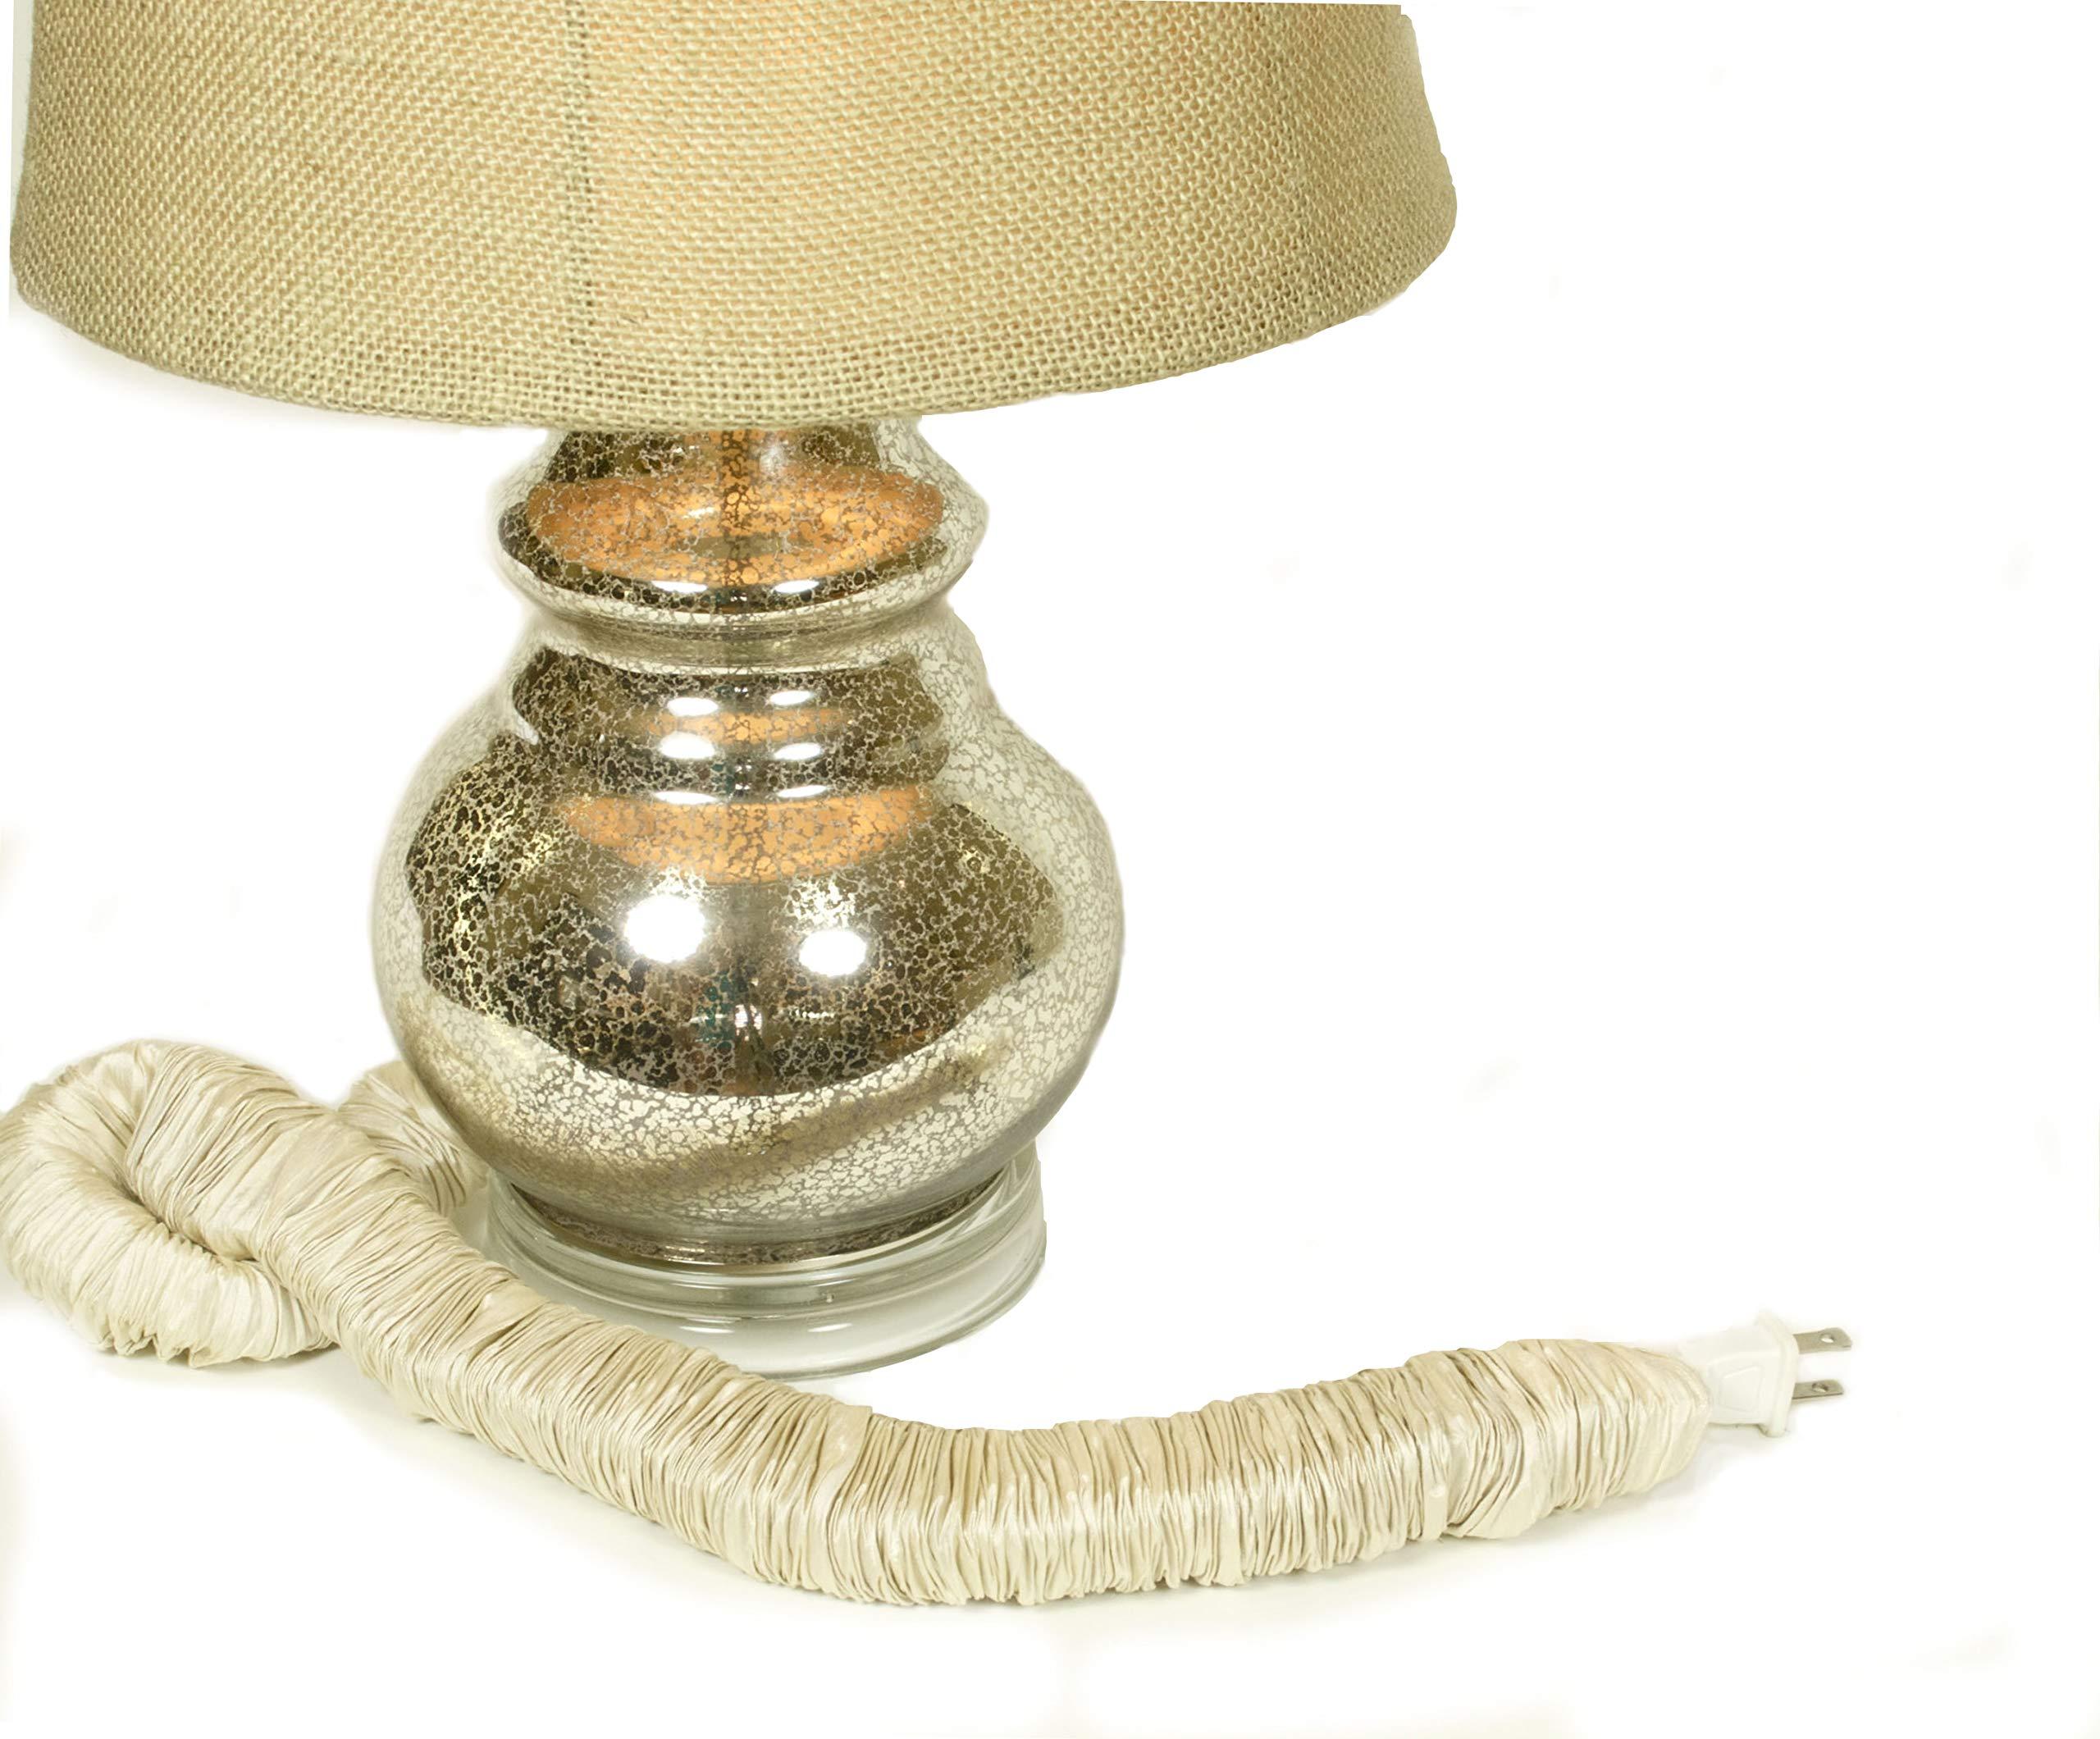 Bone Silk Lamp Cord Cover 9 ft long